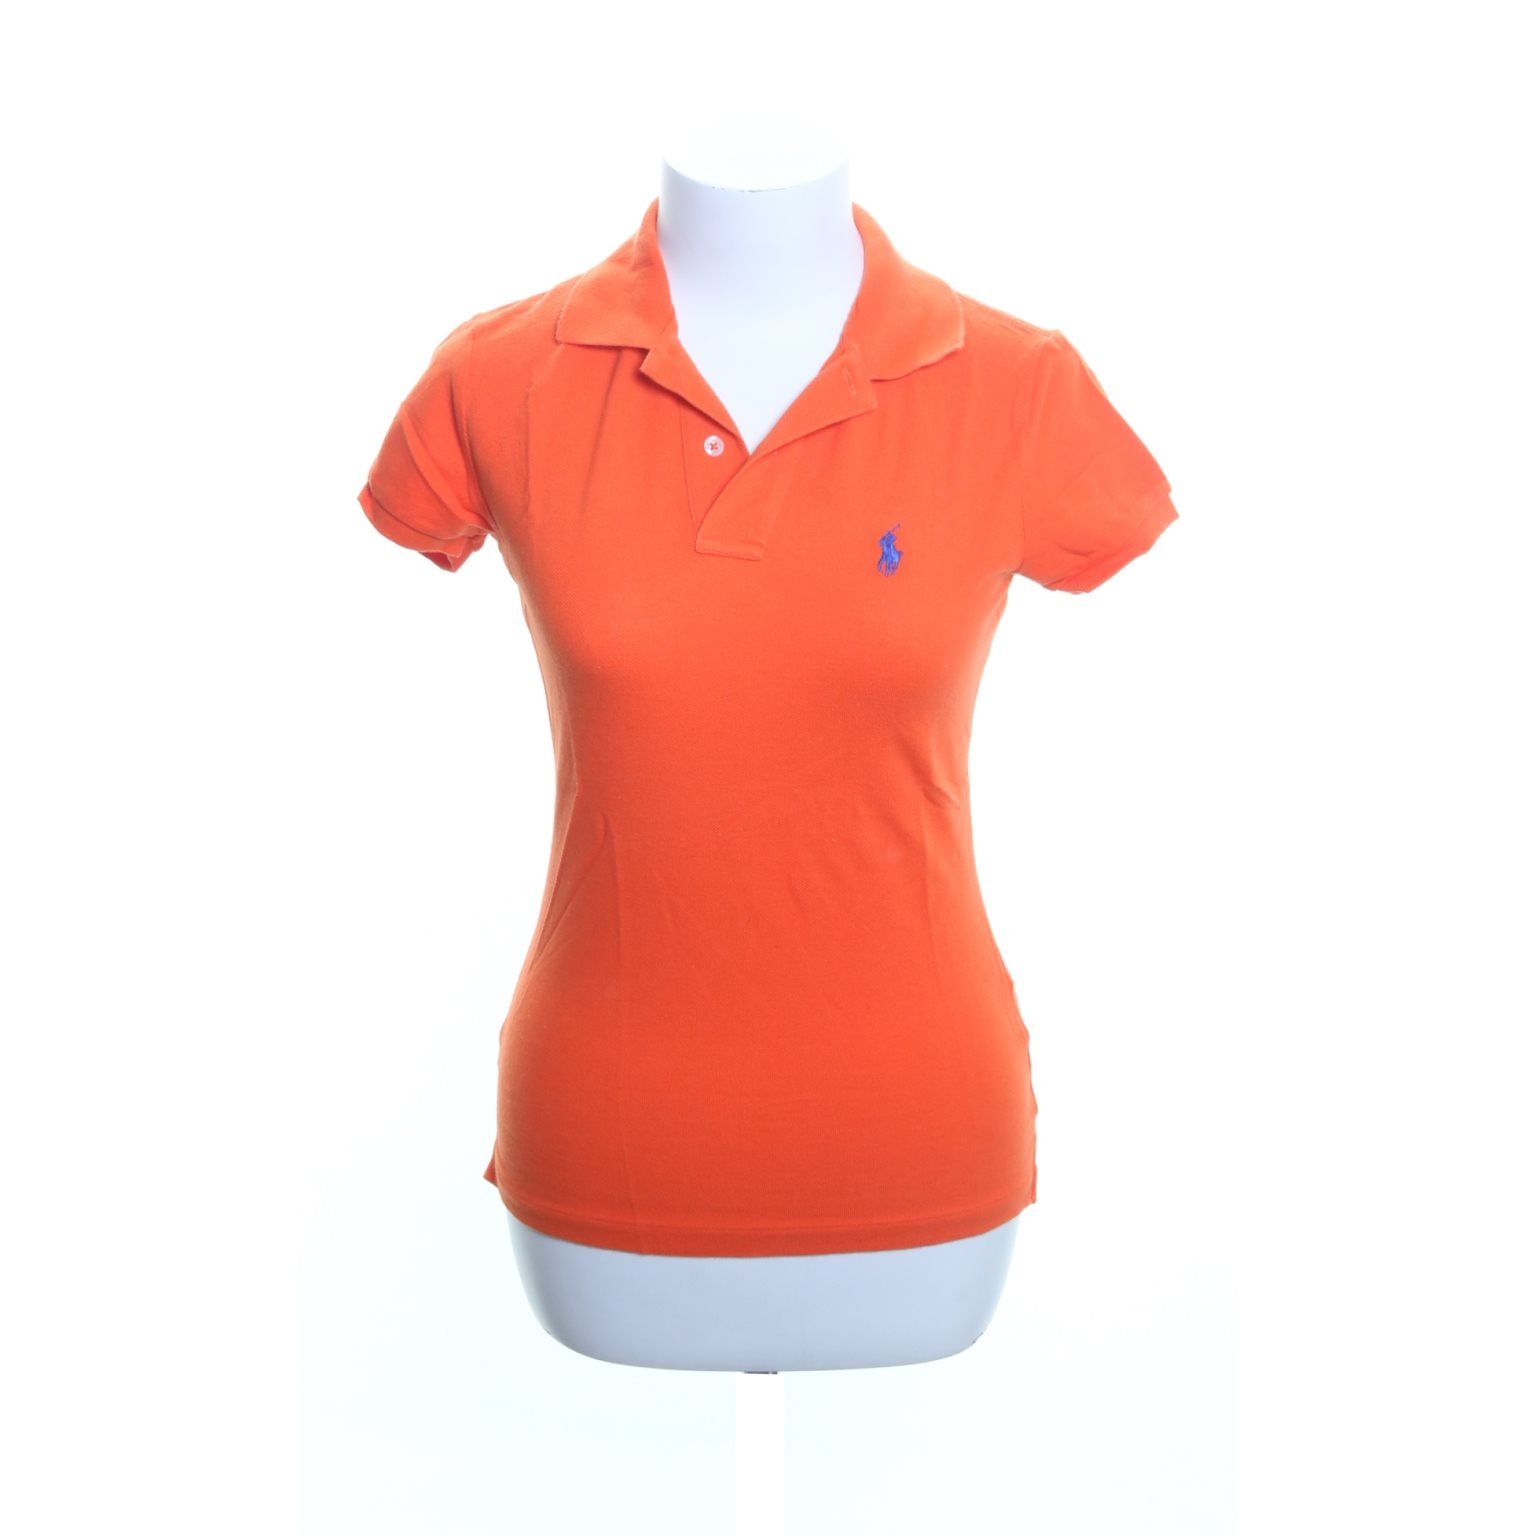 Ralph Lauren, Pikétröja, Strl: S, The skinny polo, Orange